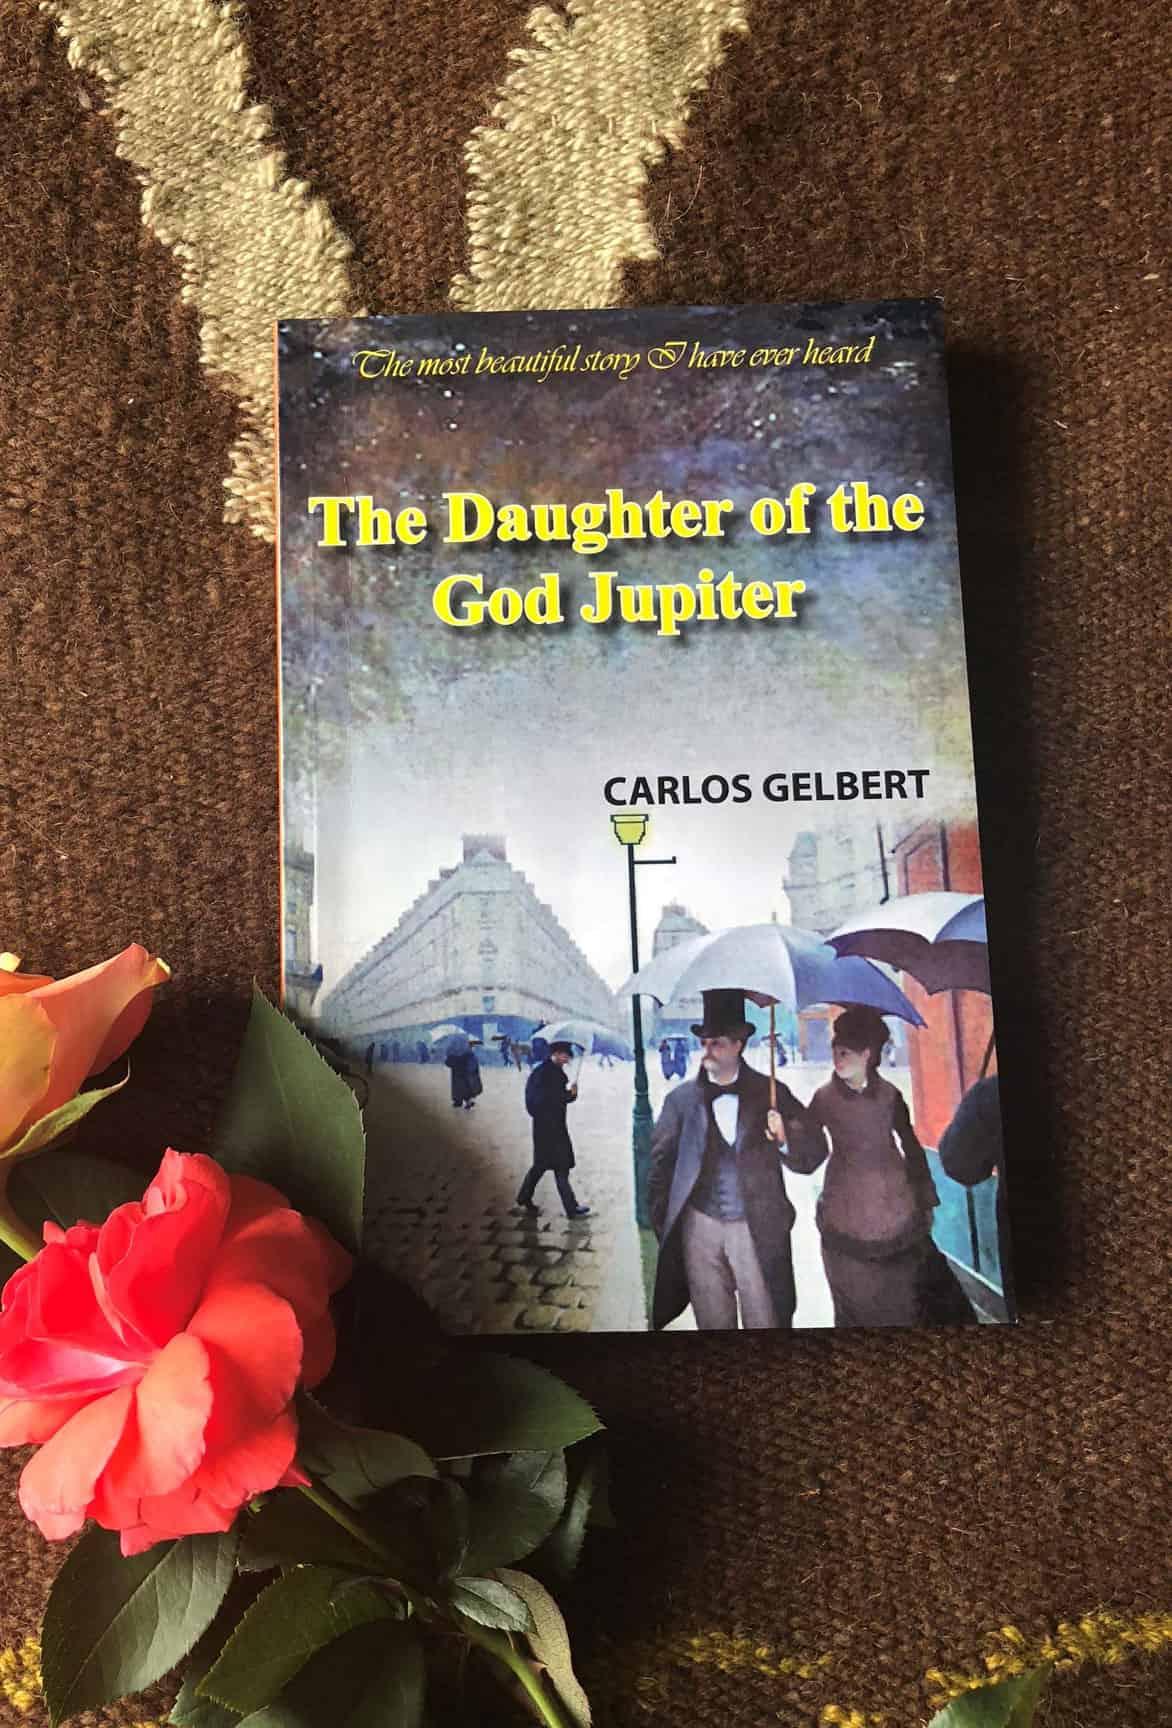 The Daughter of the God Jupiter